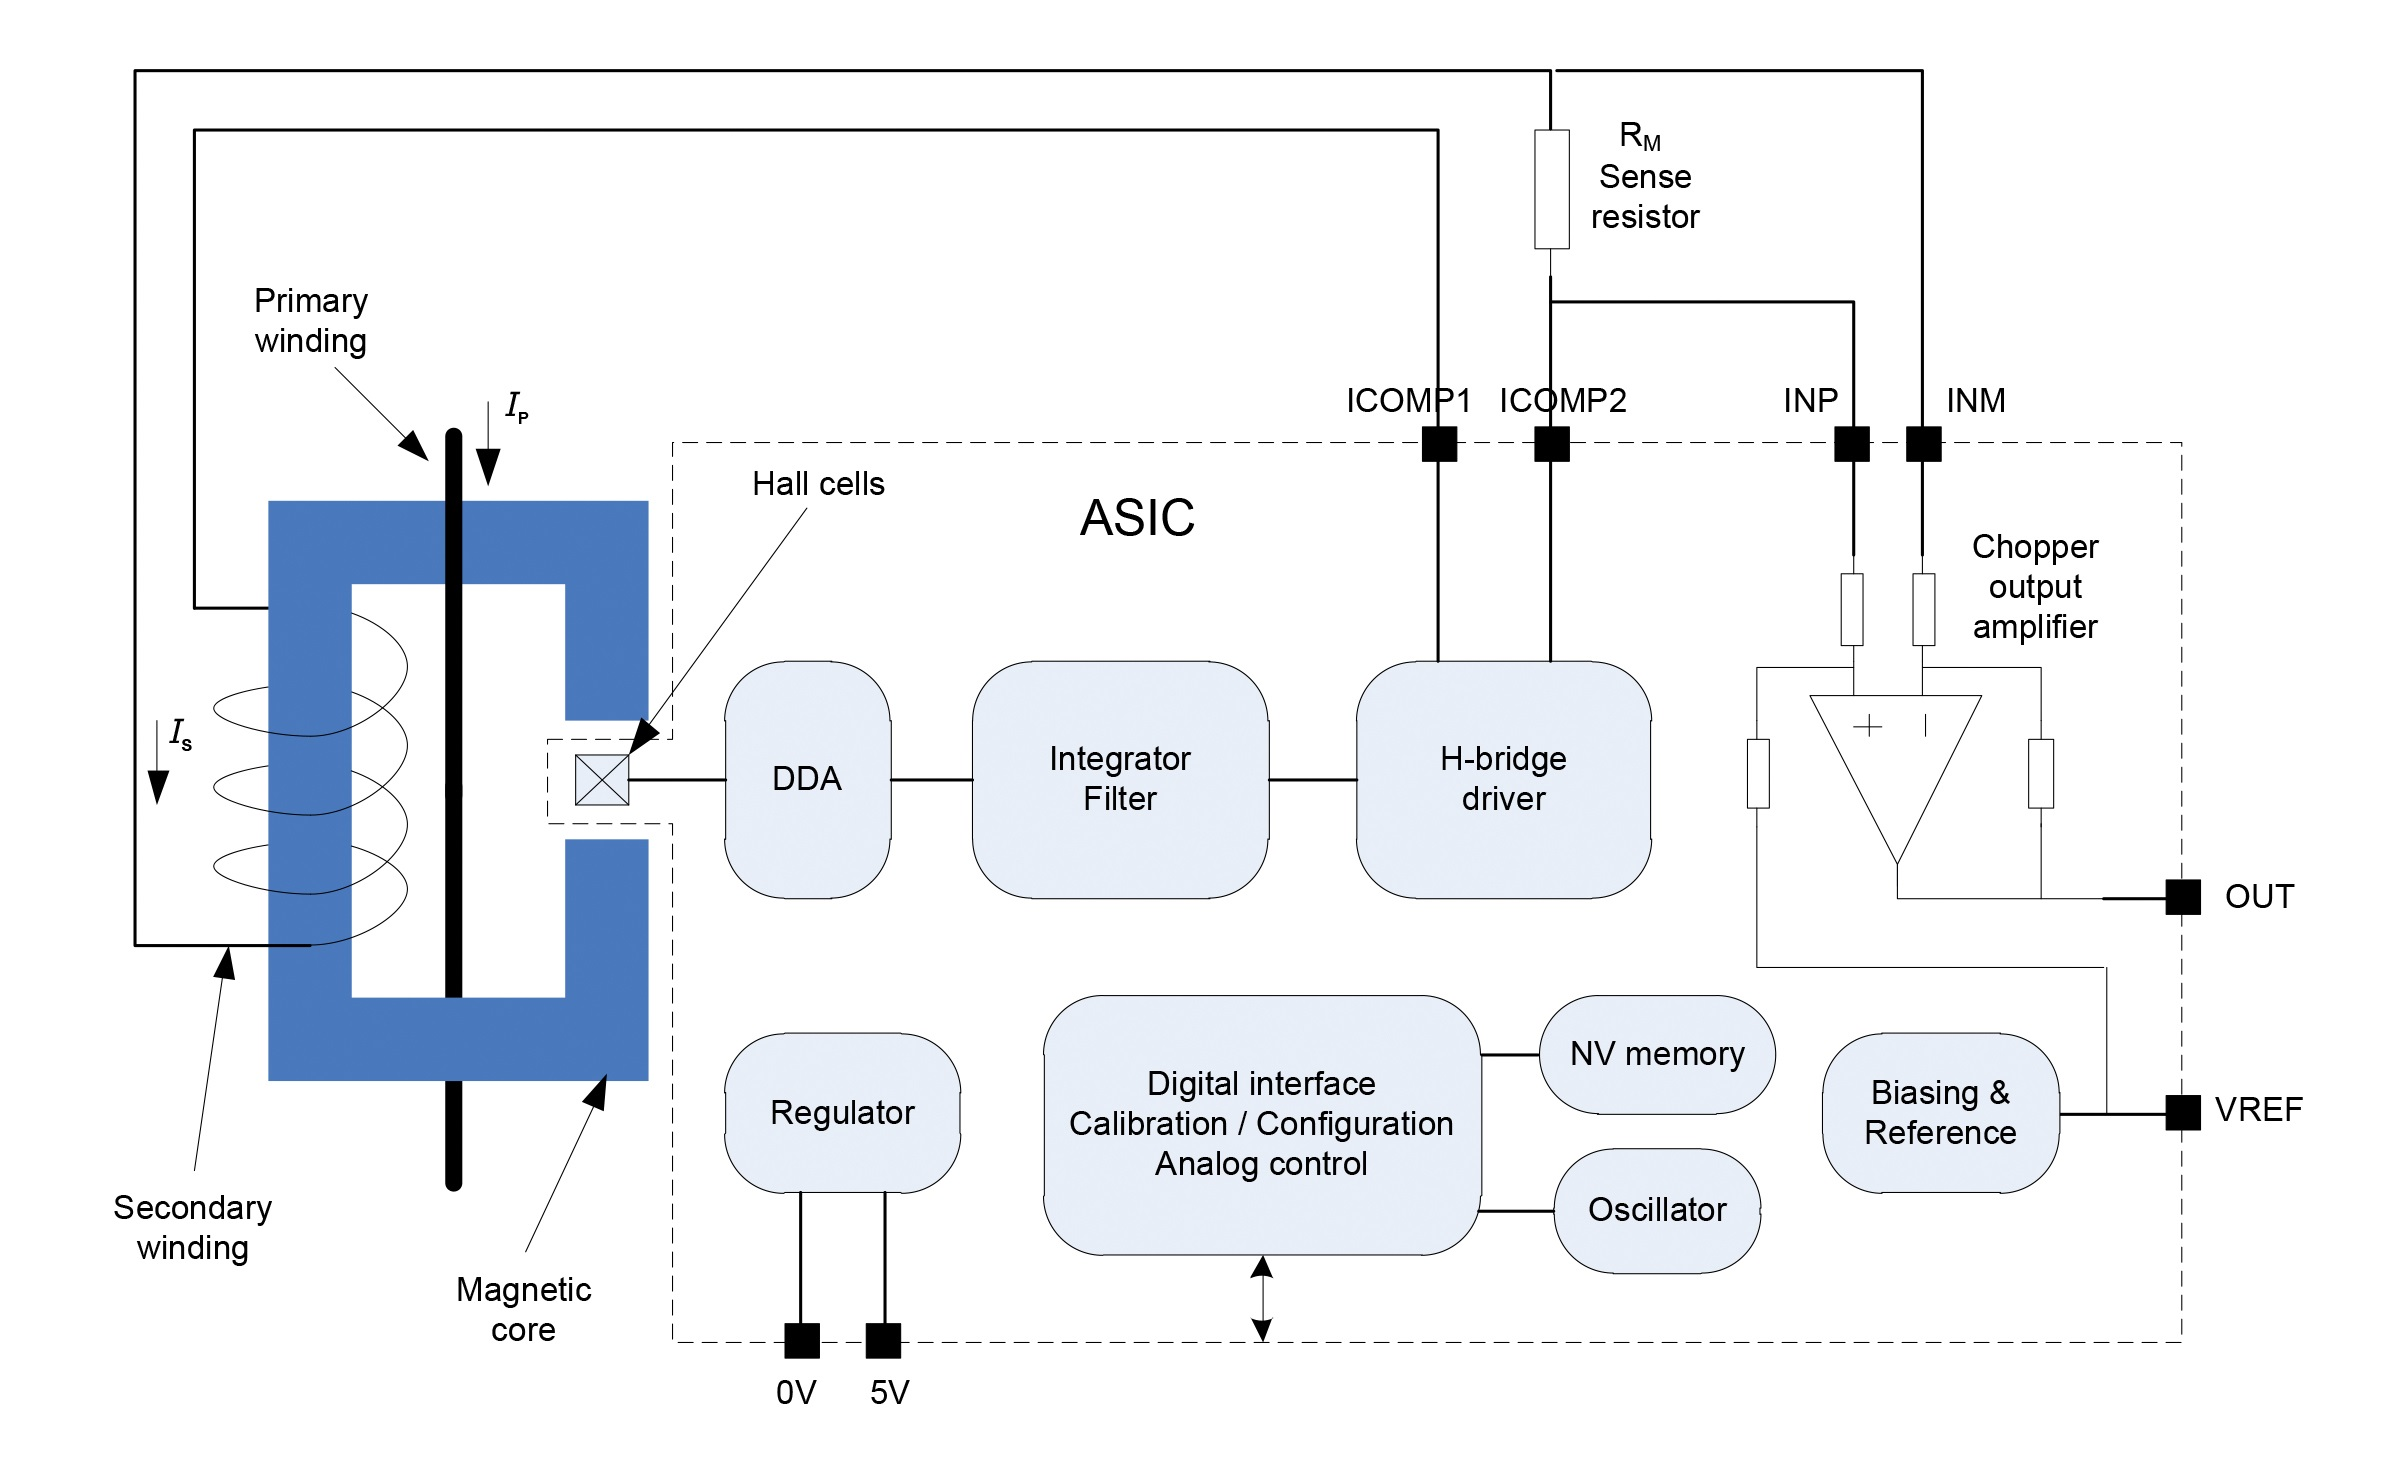 Asic Design Improves Transducer Performance